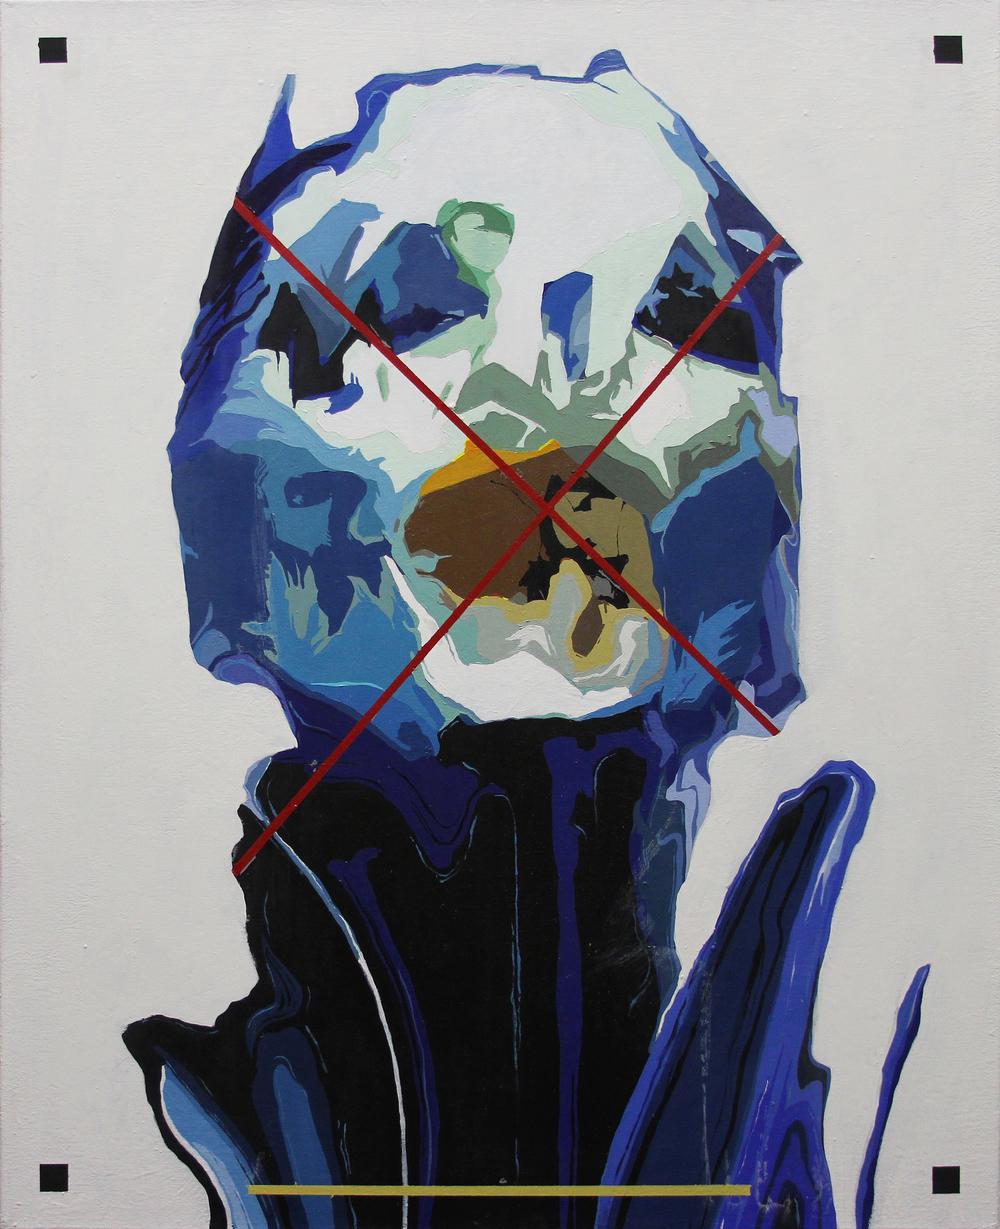 EX   2015 Acrylic on canvas 30 x 24 in 76.2 x 60.9 cm